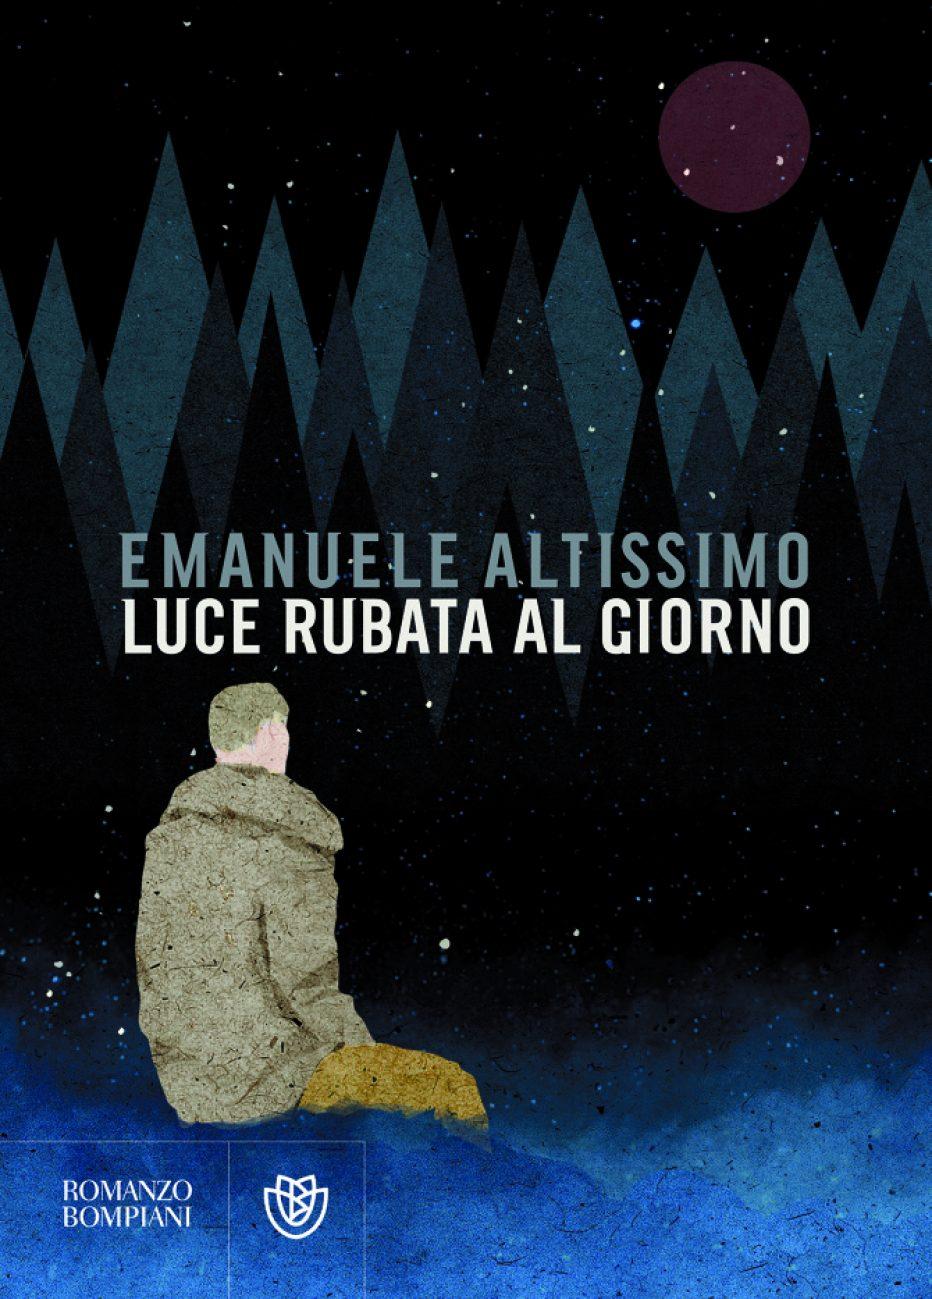 Straordinario esordio per Emanuele Altissimo